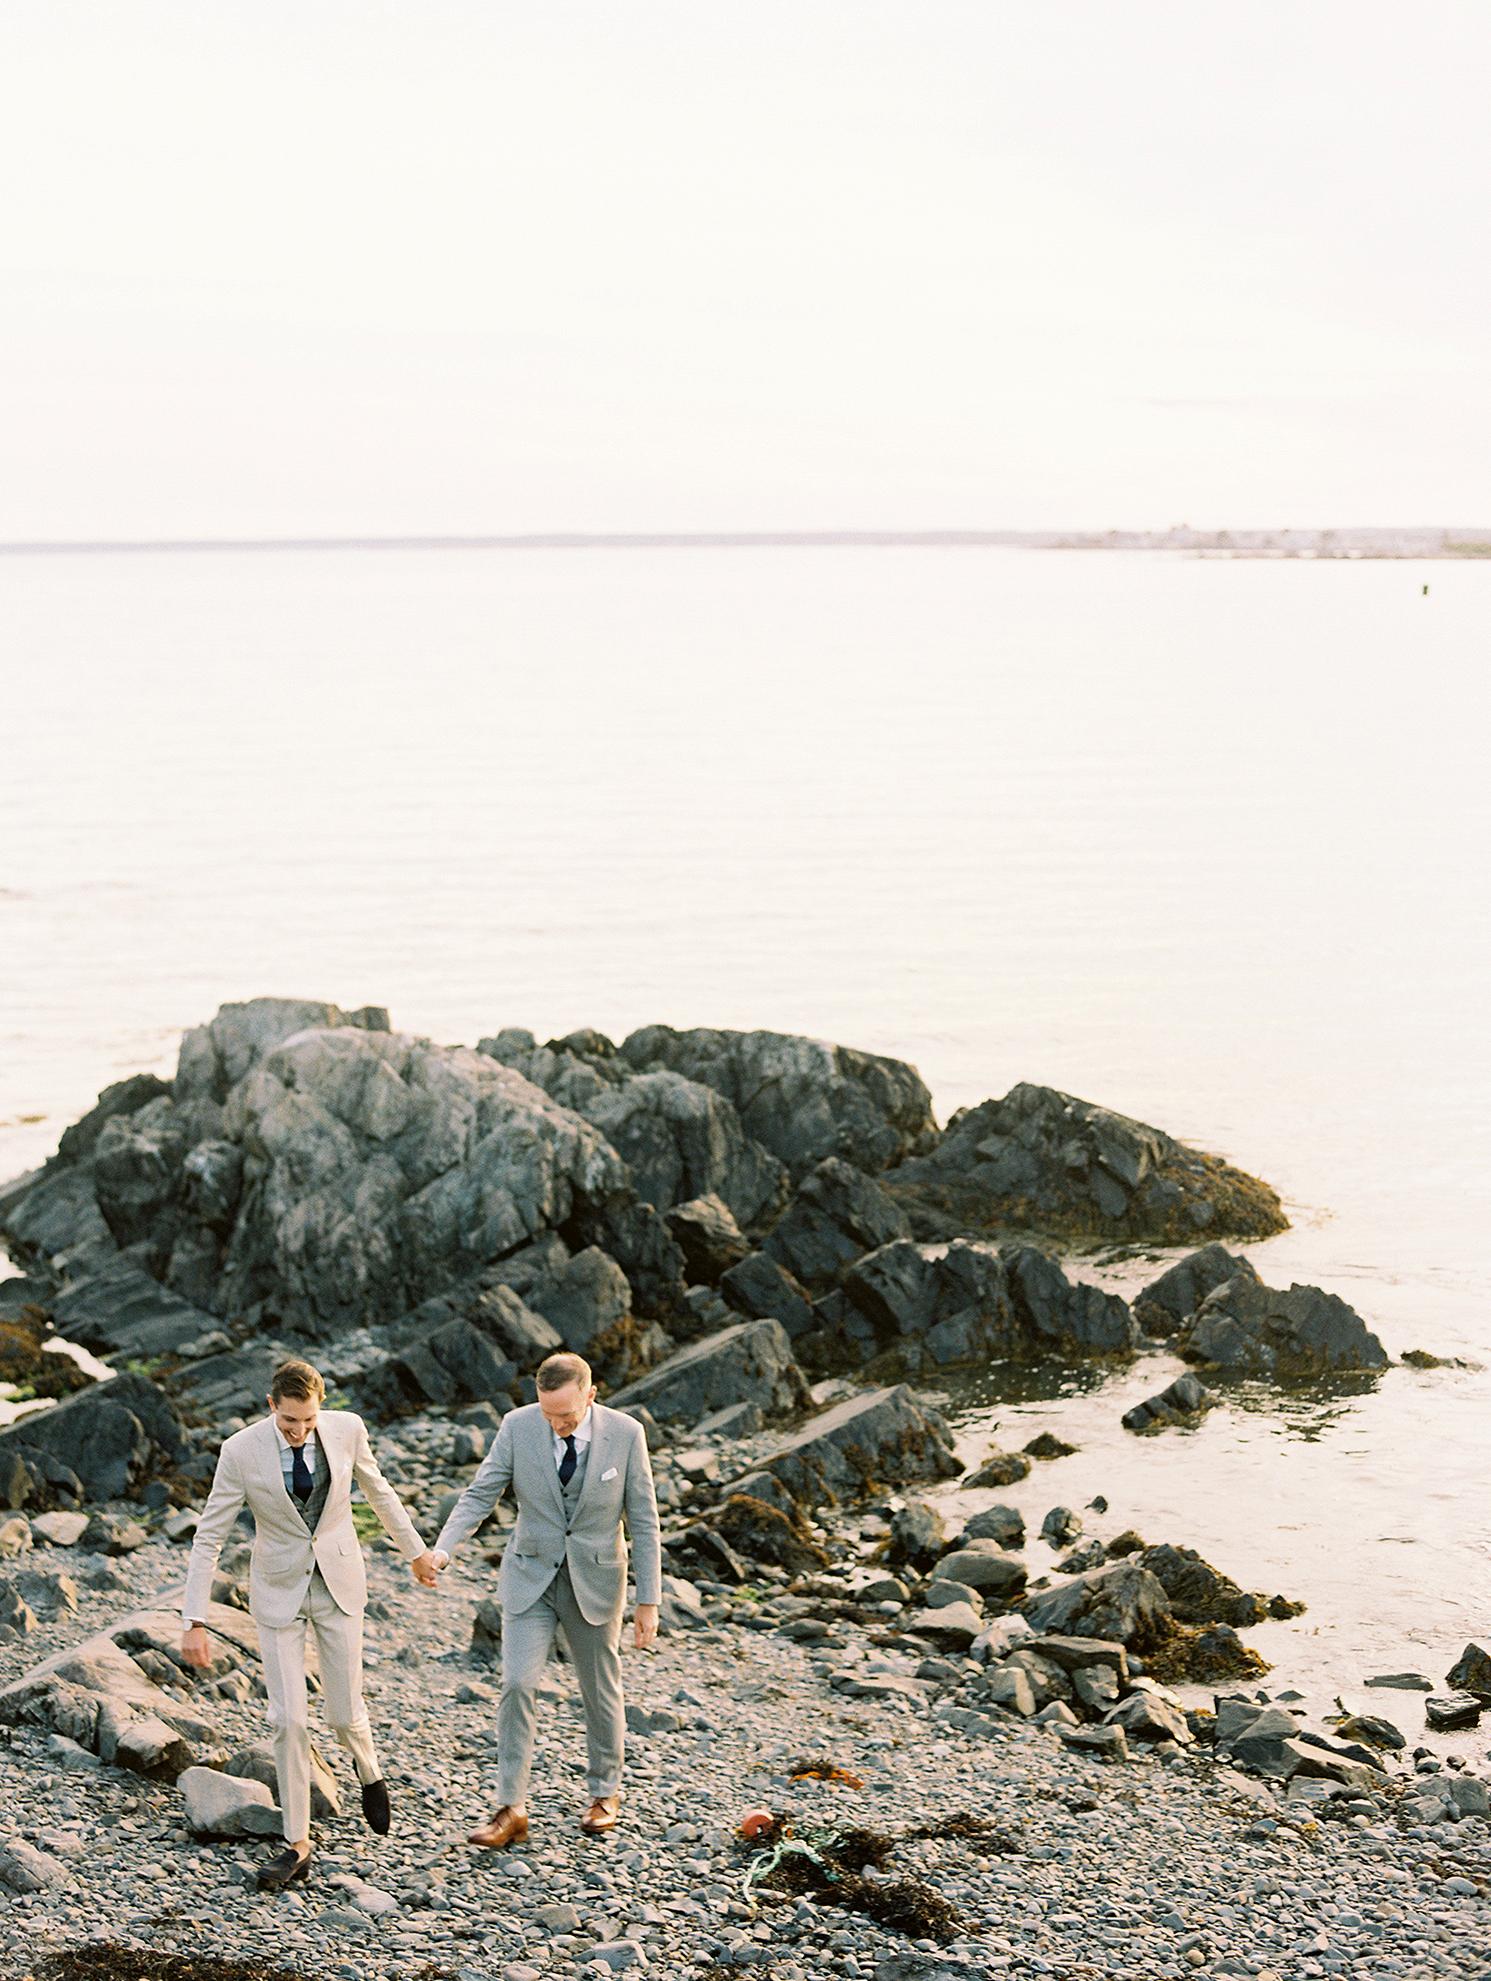 charles andrew wedding grooms on rocky shoreline